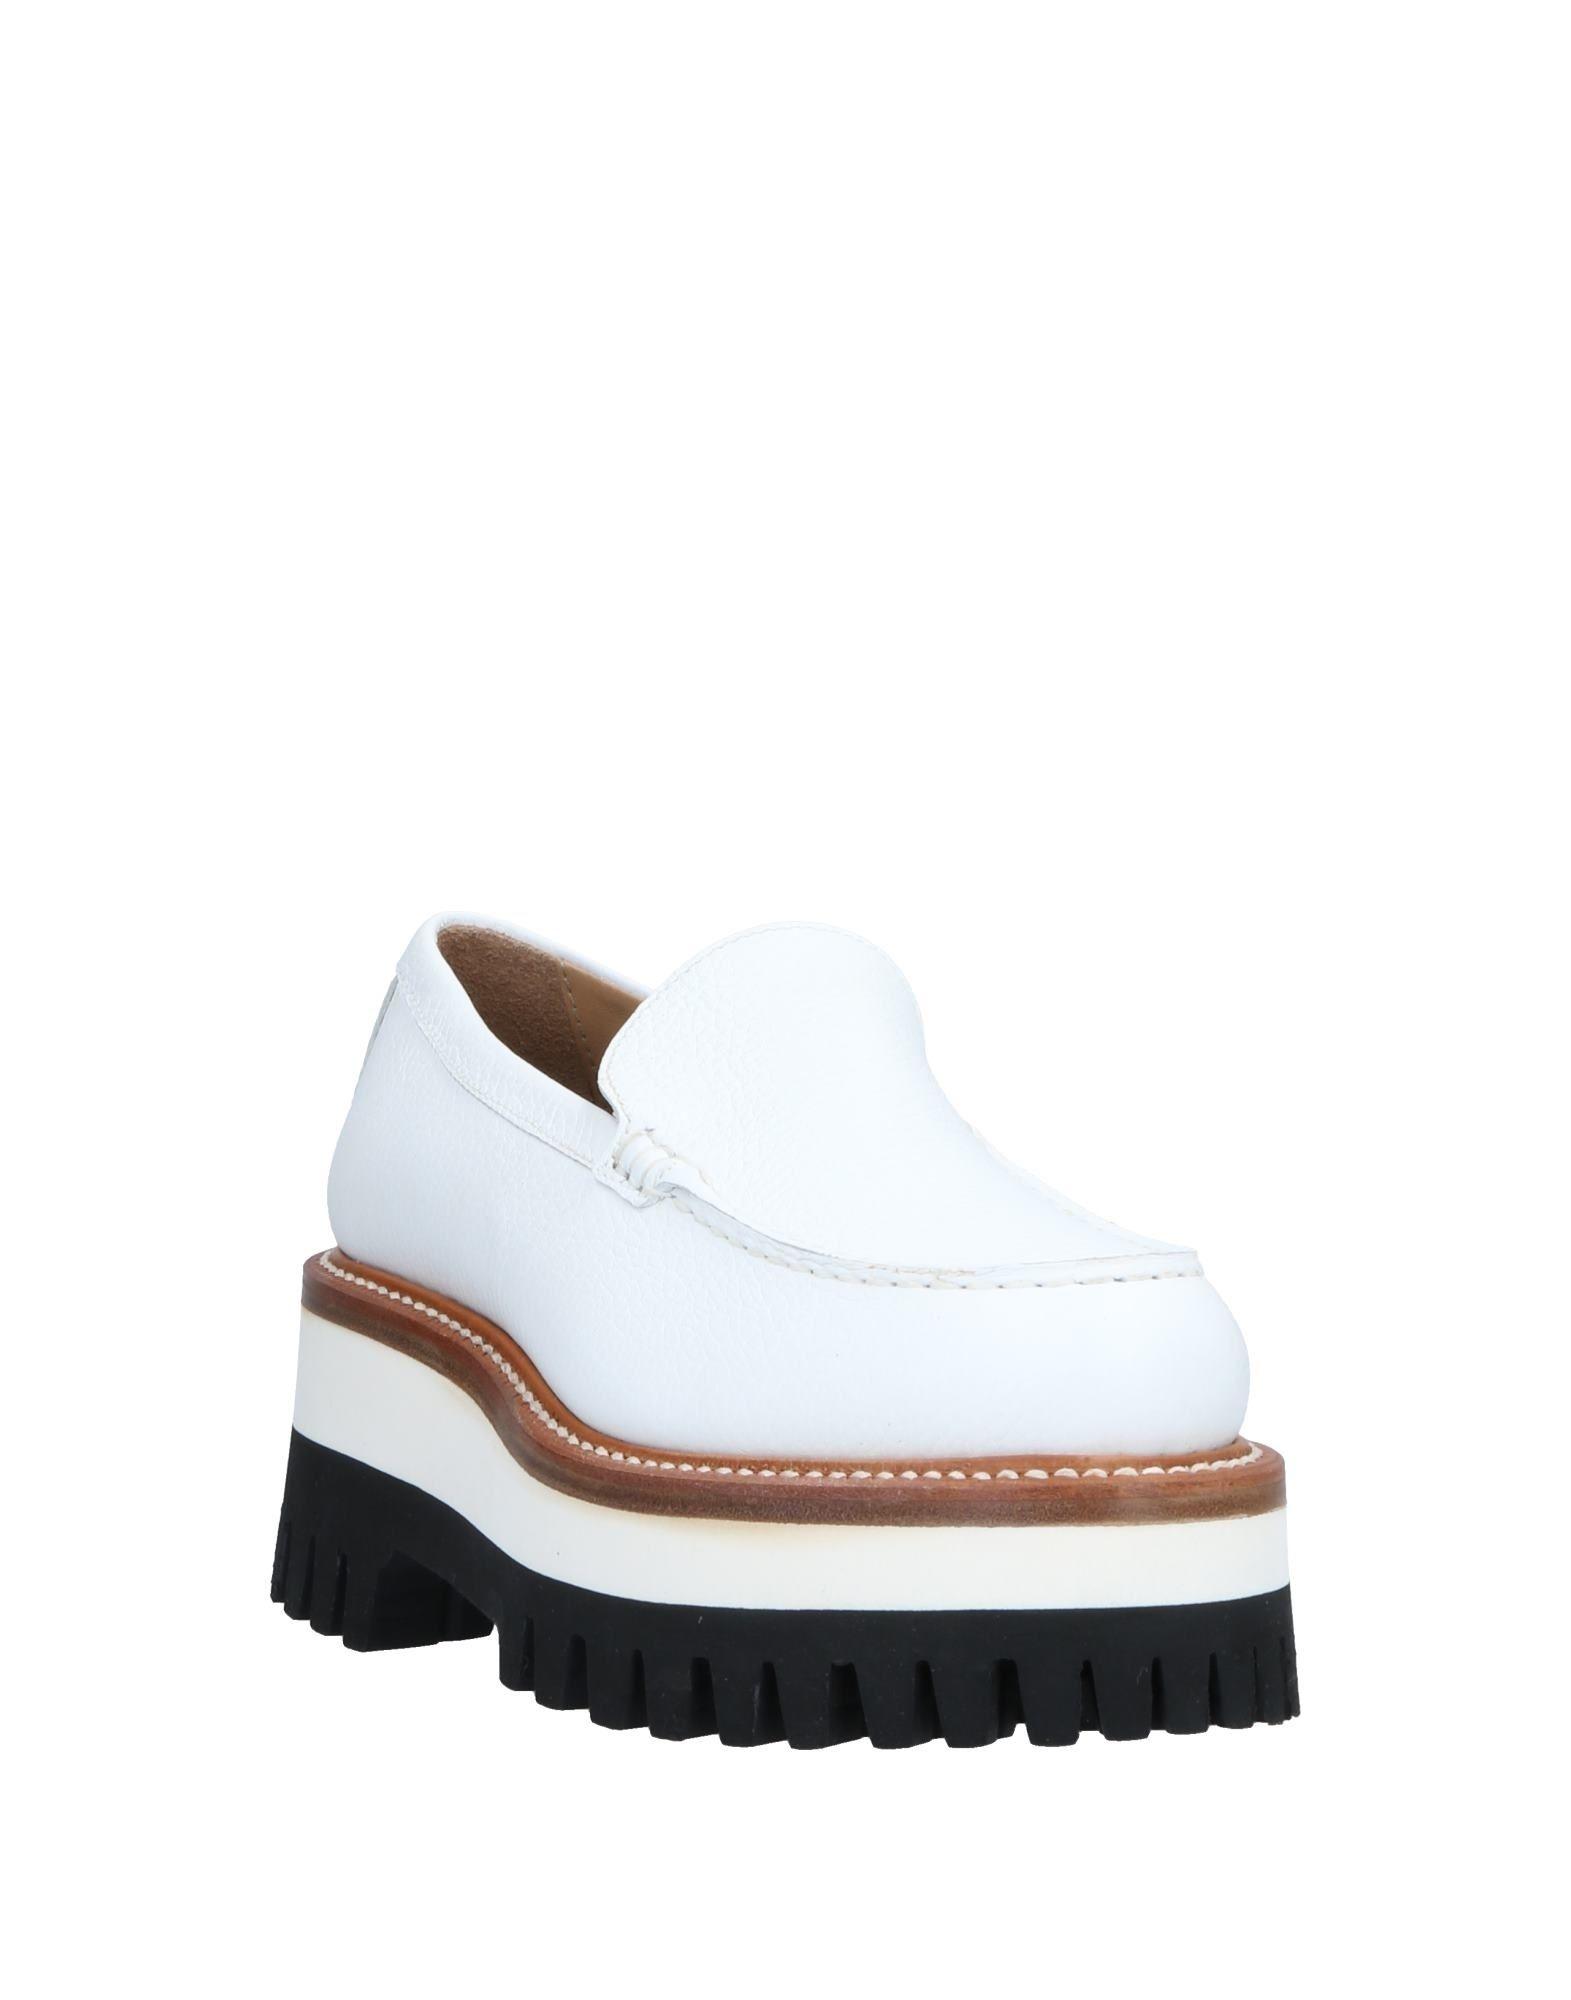 Stilvolle billige Schuhe 11517172TJ Cappelletti Mokassins Damen  11517172TJ Schuhe 90f8c2